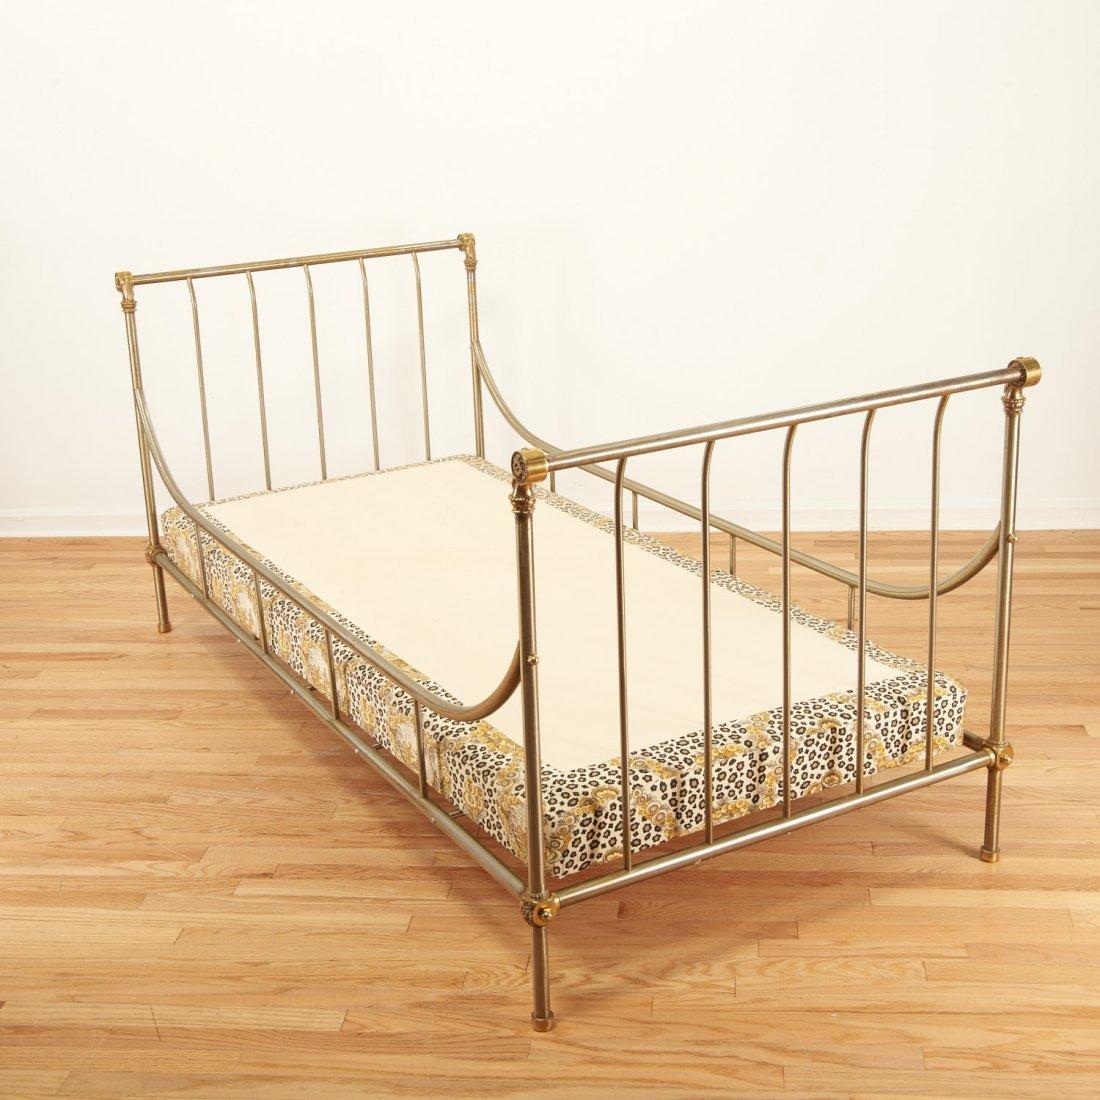 Maison Jansen style brass, steel campaign bed - 8